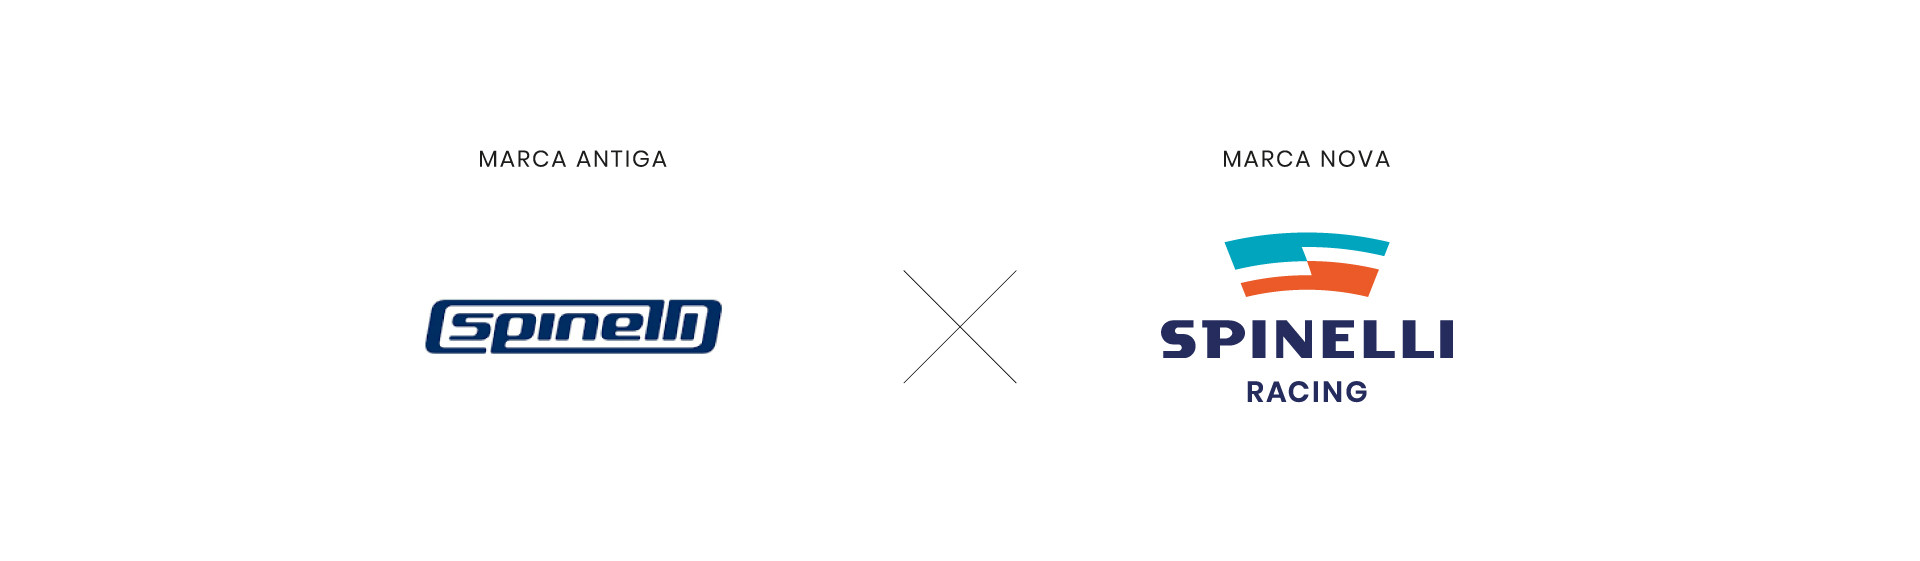 img-portfolio-spinelli-racing-voadora (9